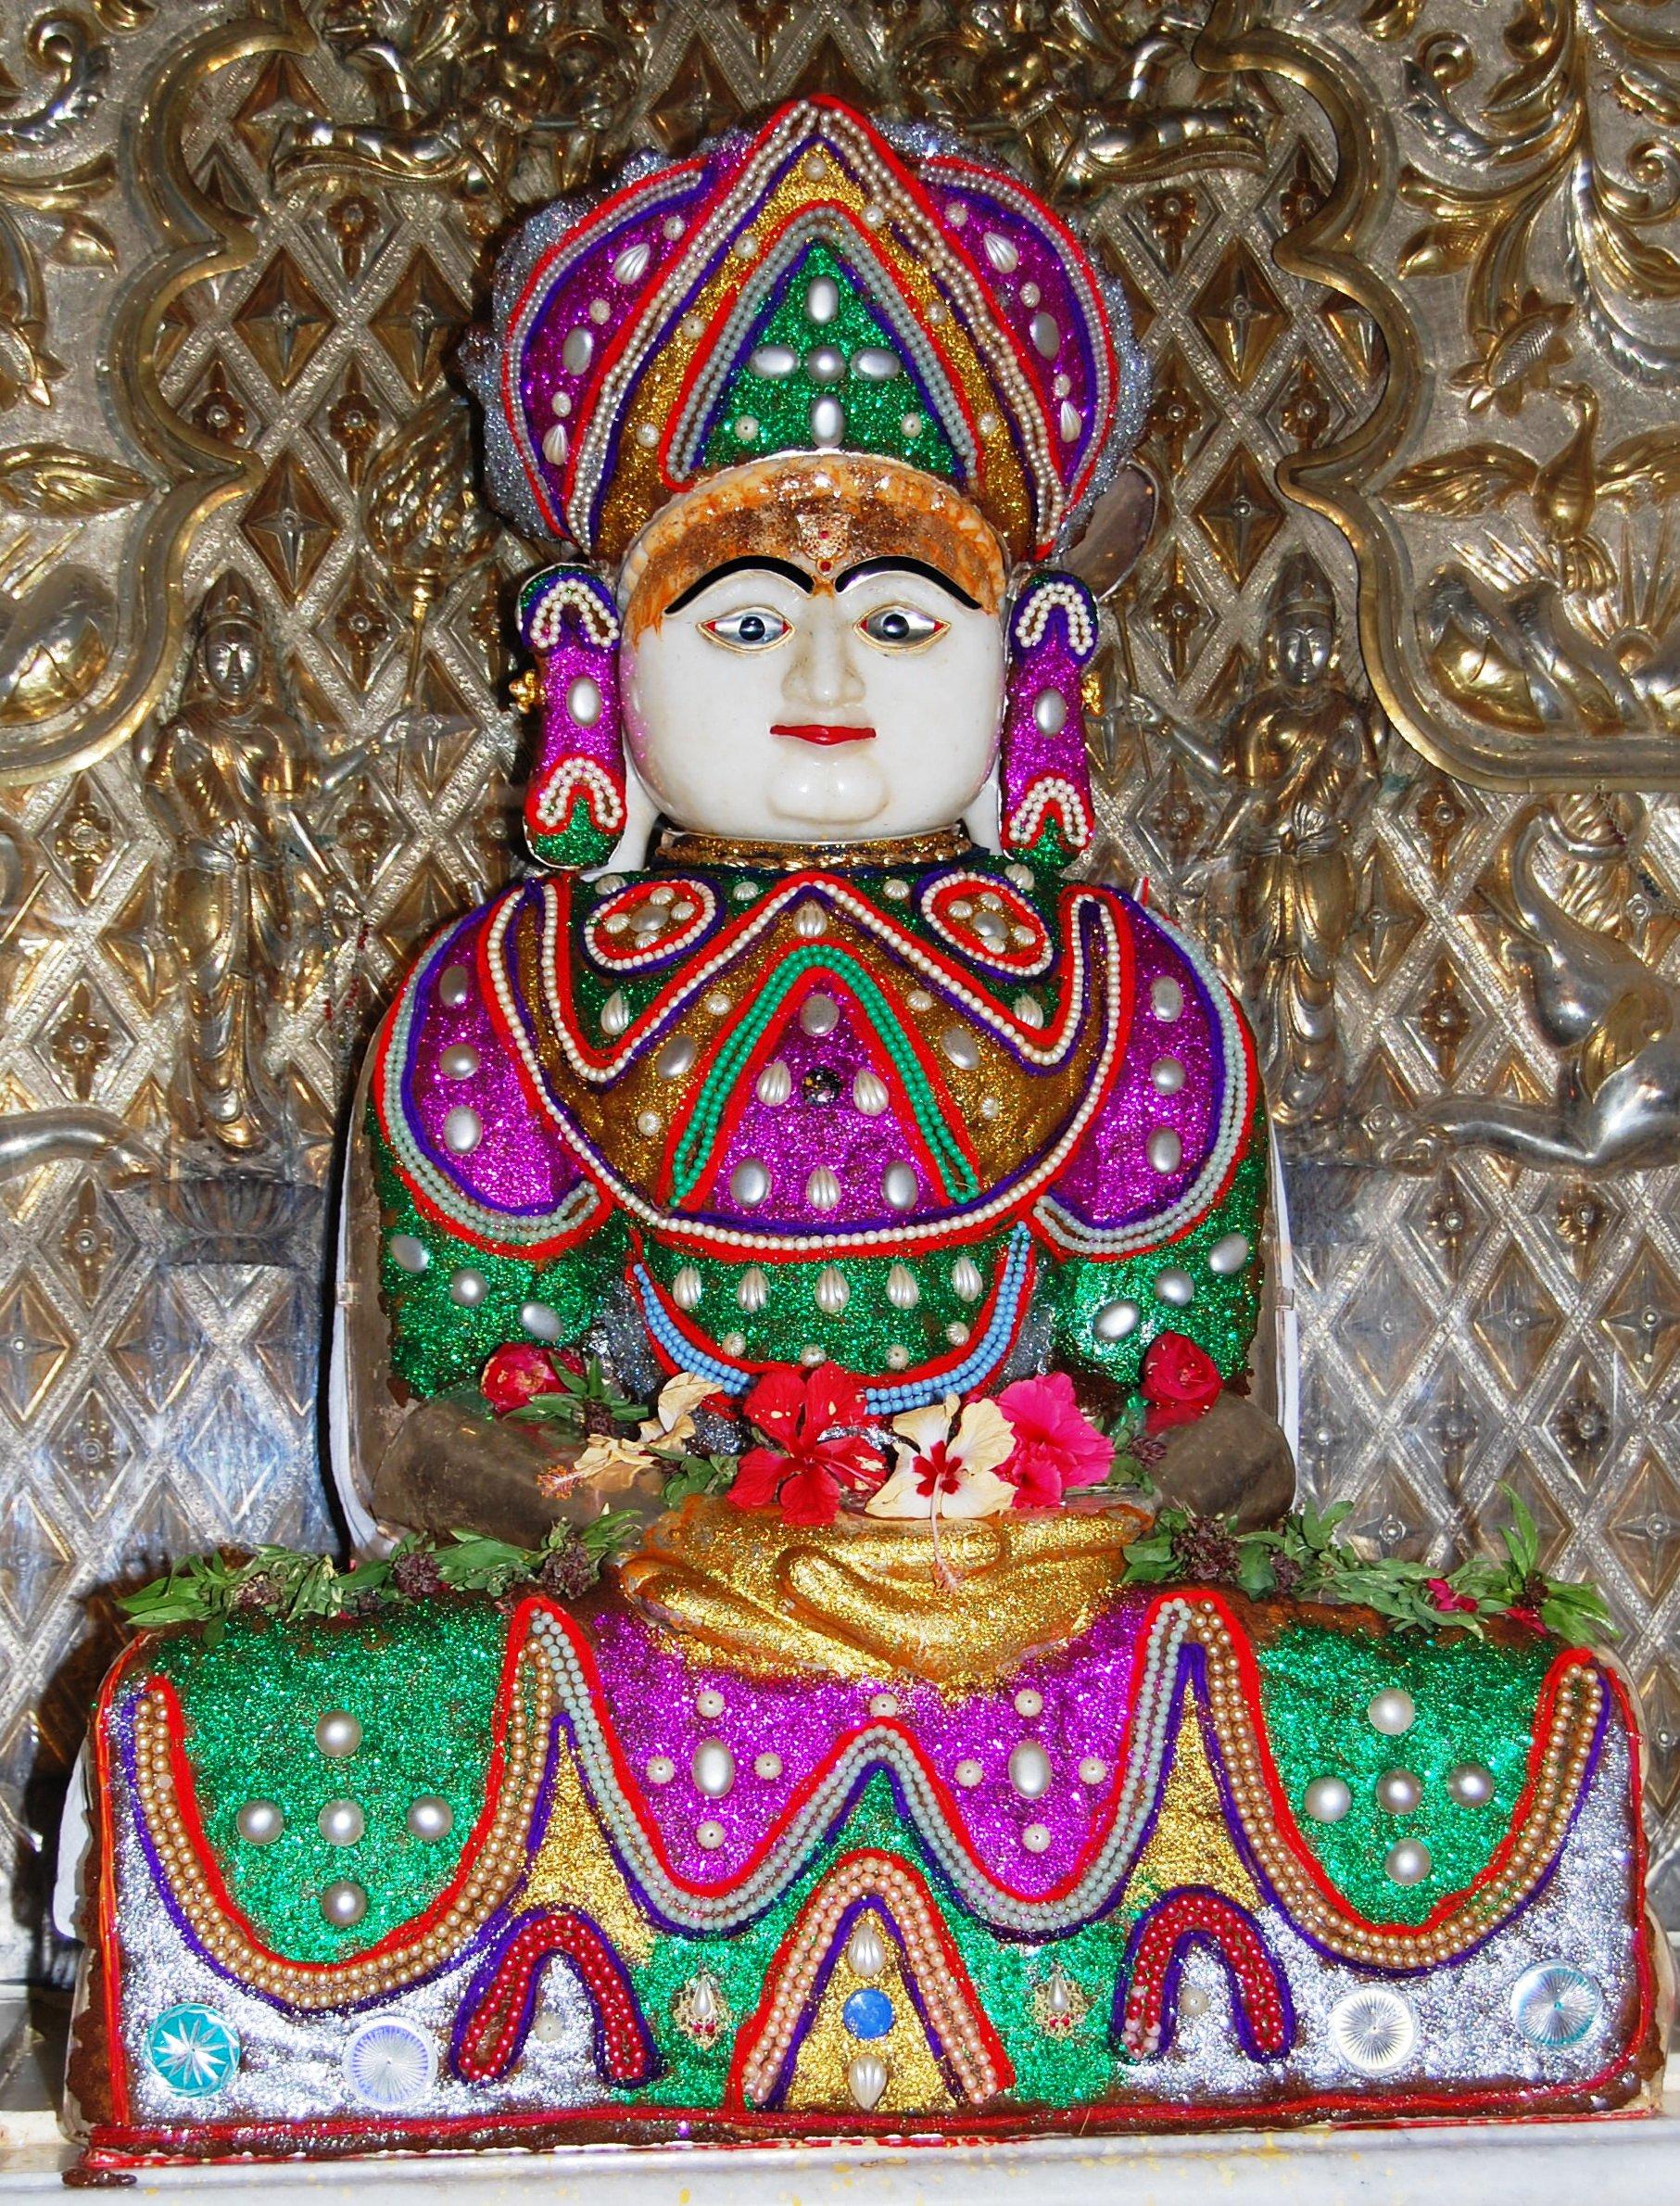 File:Sri Adinath Bhagwan, Santhu.jpg - Wikimedia Commons